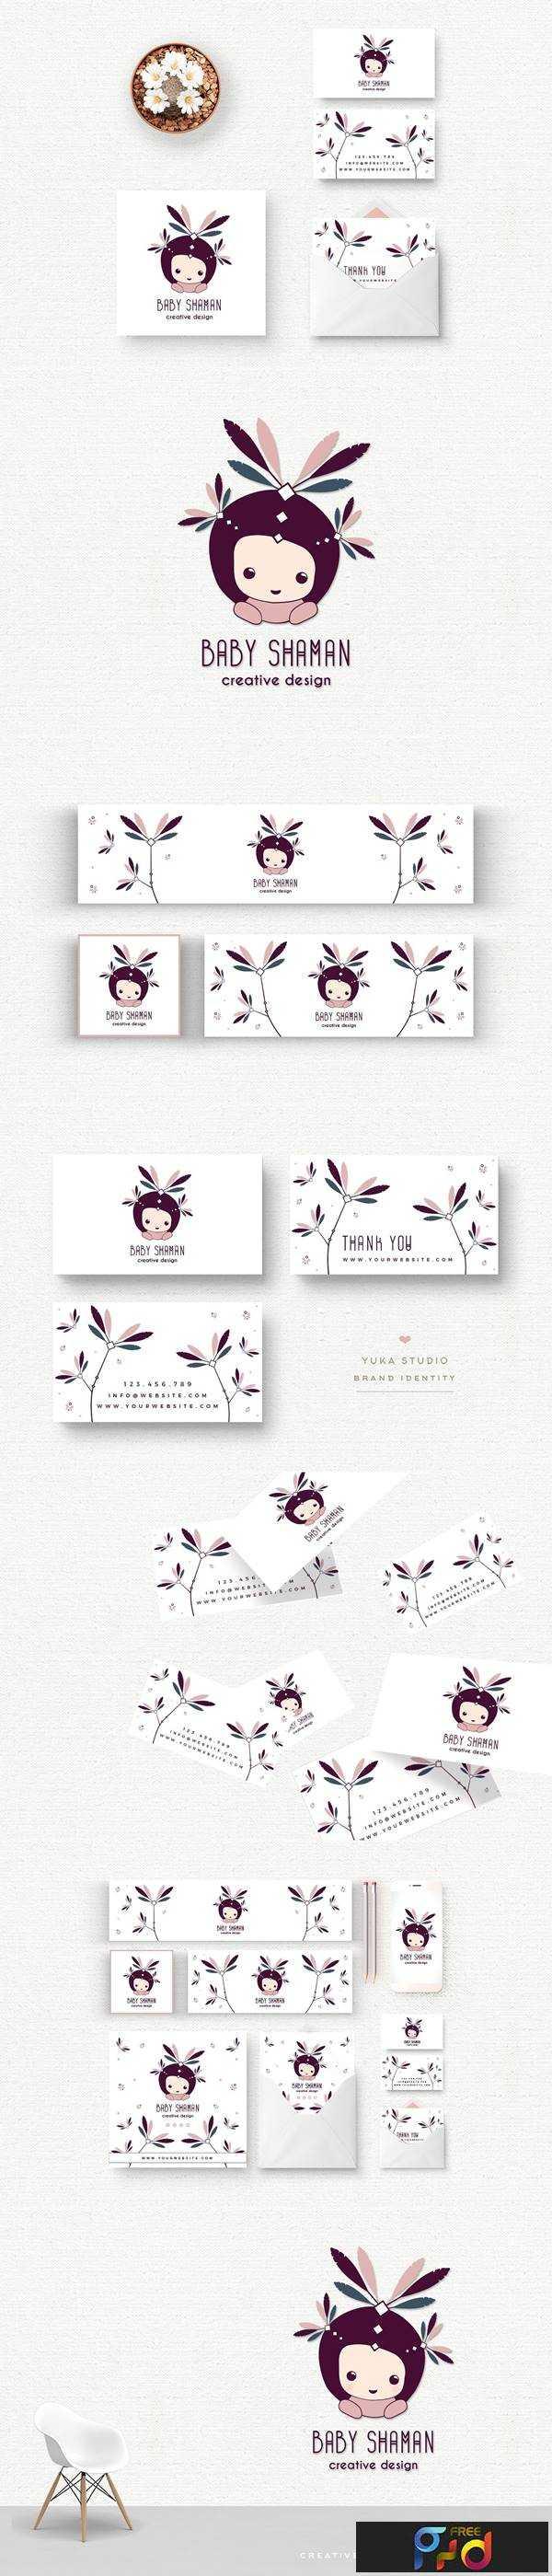 1806170 Artistic Brand Design 2578324 1